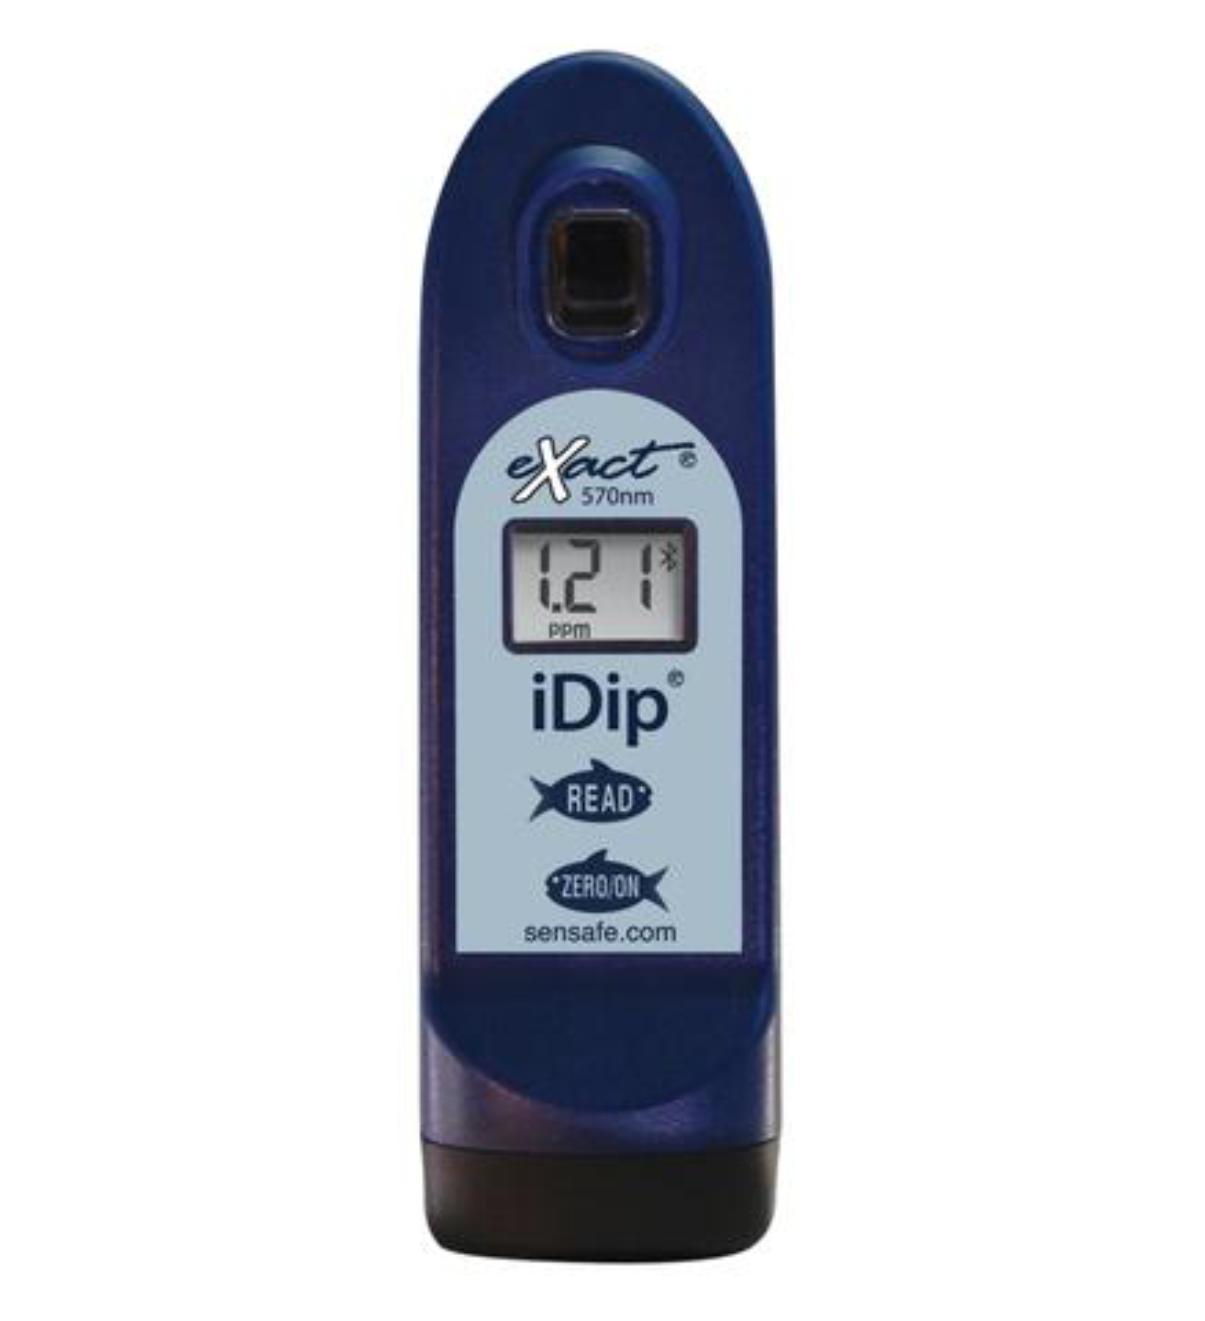 купить Фотометр eXact iDip® 570 Smart